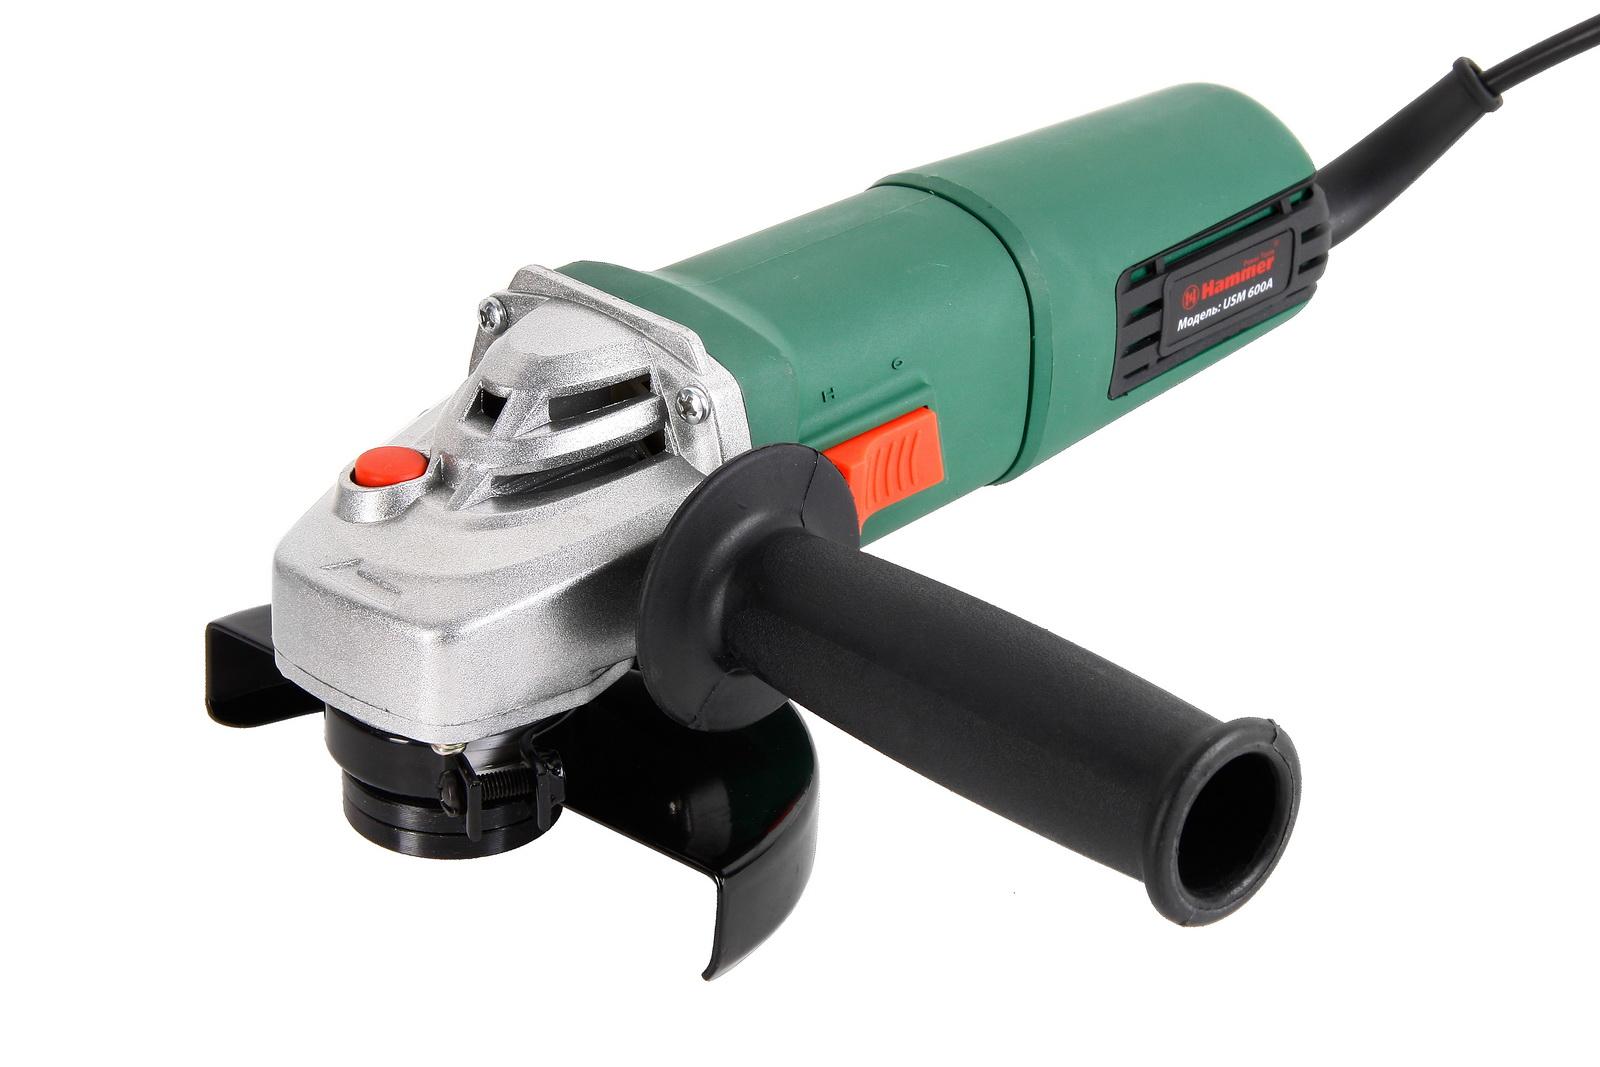 УШМ (болгарка) Hammer Usm600a